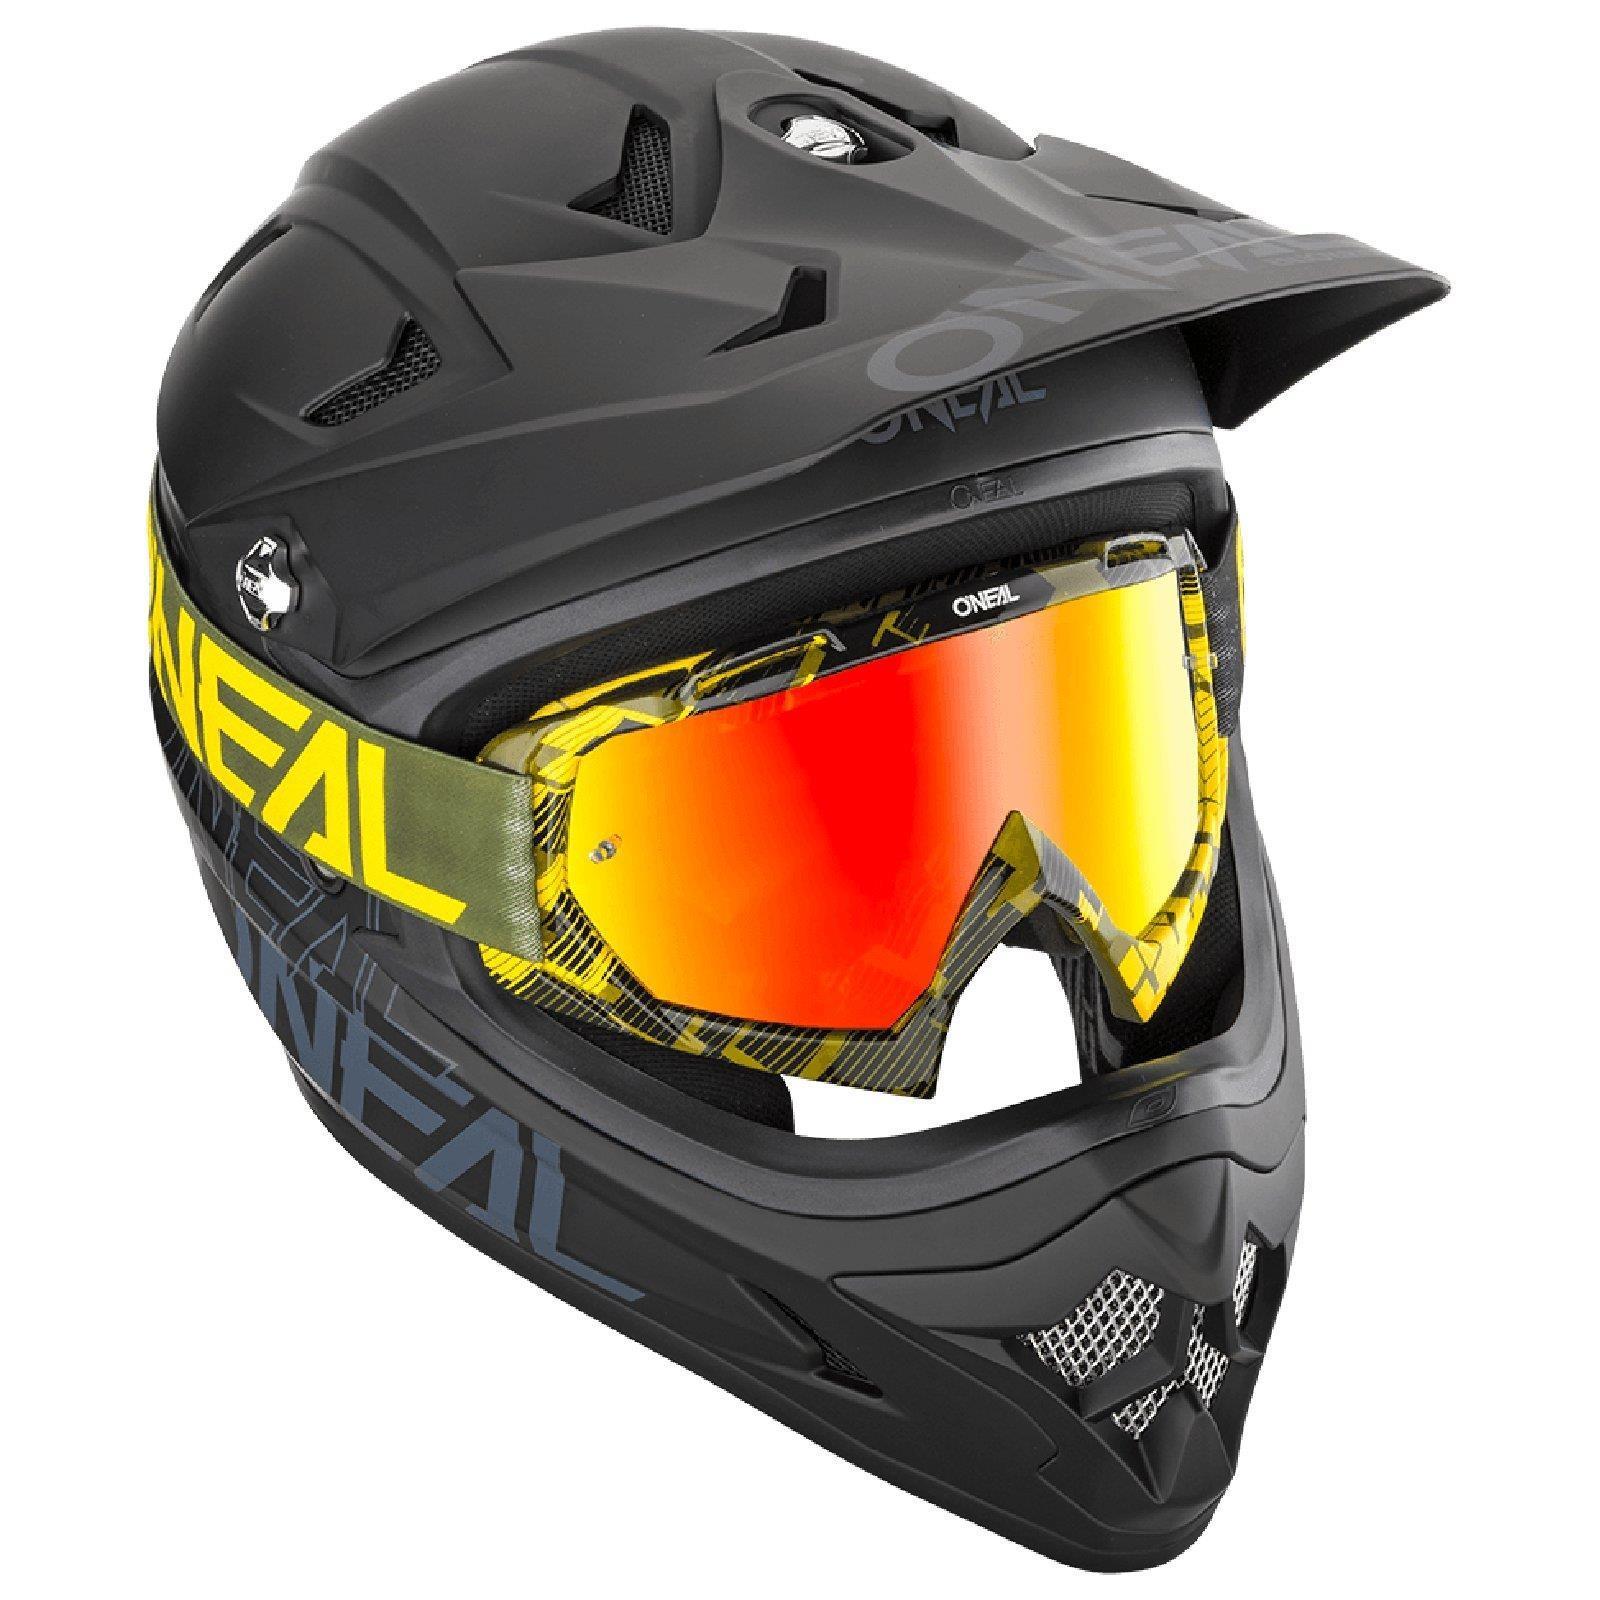 miniatuur 17 - O'Neal B-10 Goggle Pixel Radium Moto Cross Brille Downhill AntiFog Mountainbike